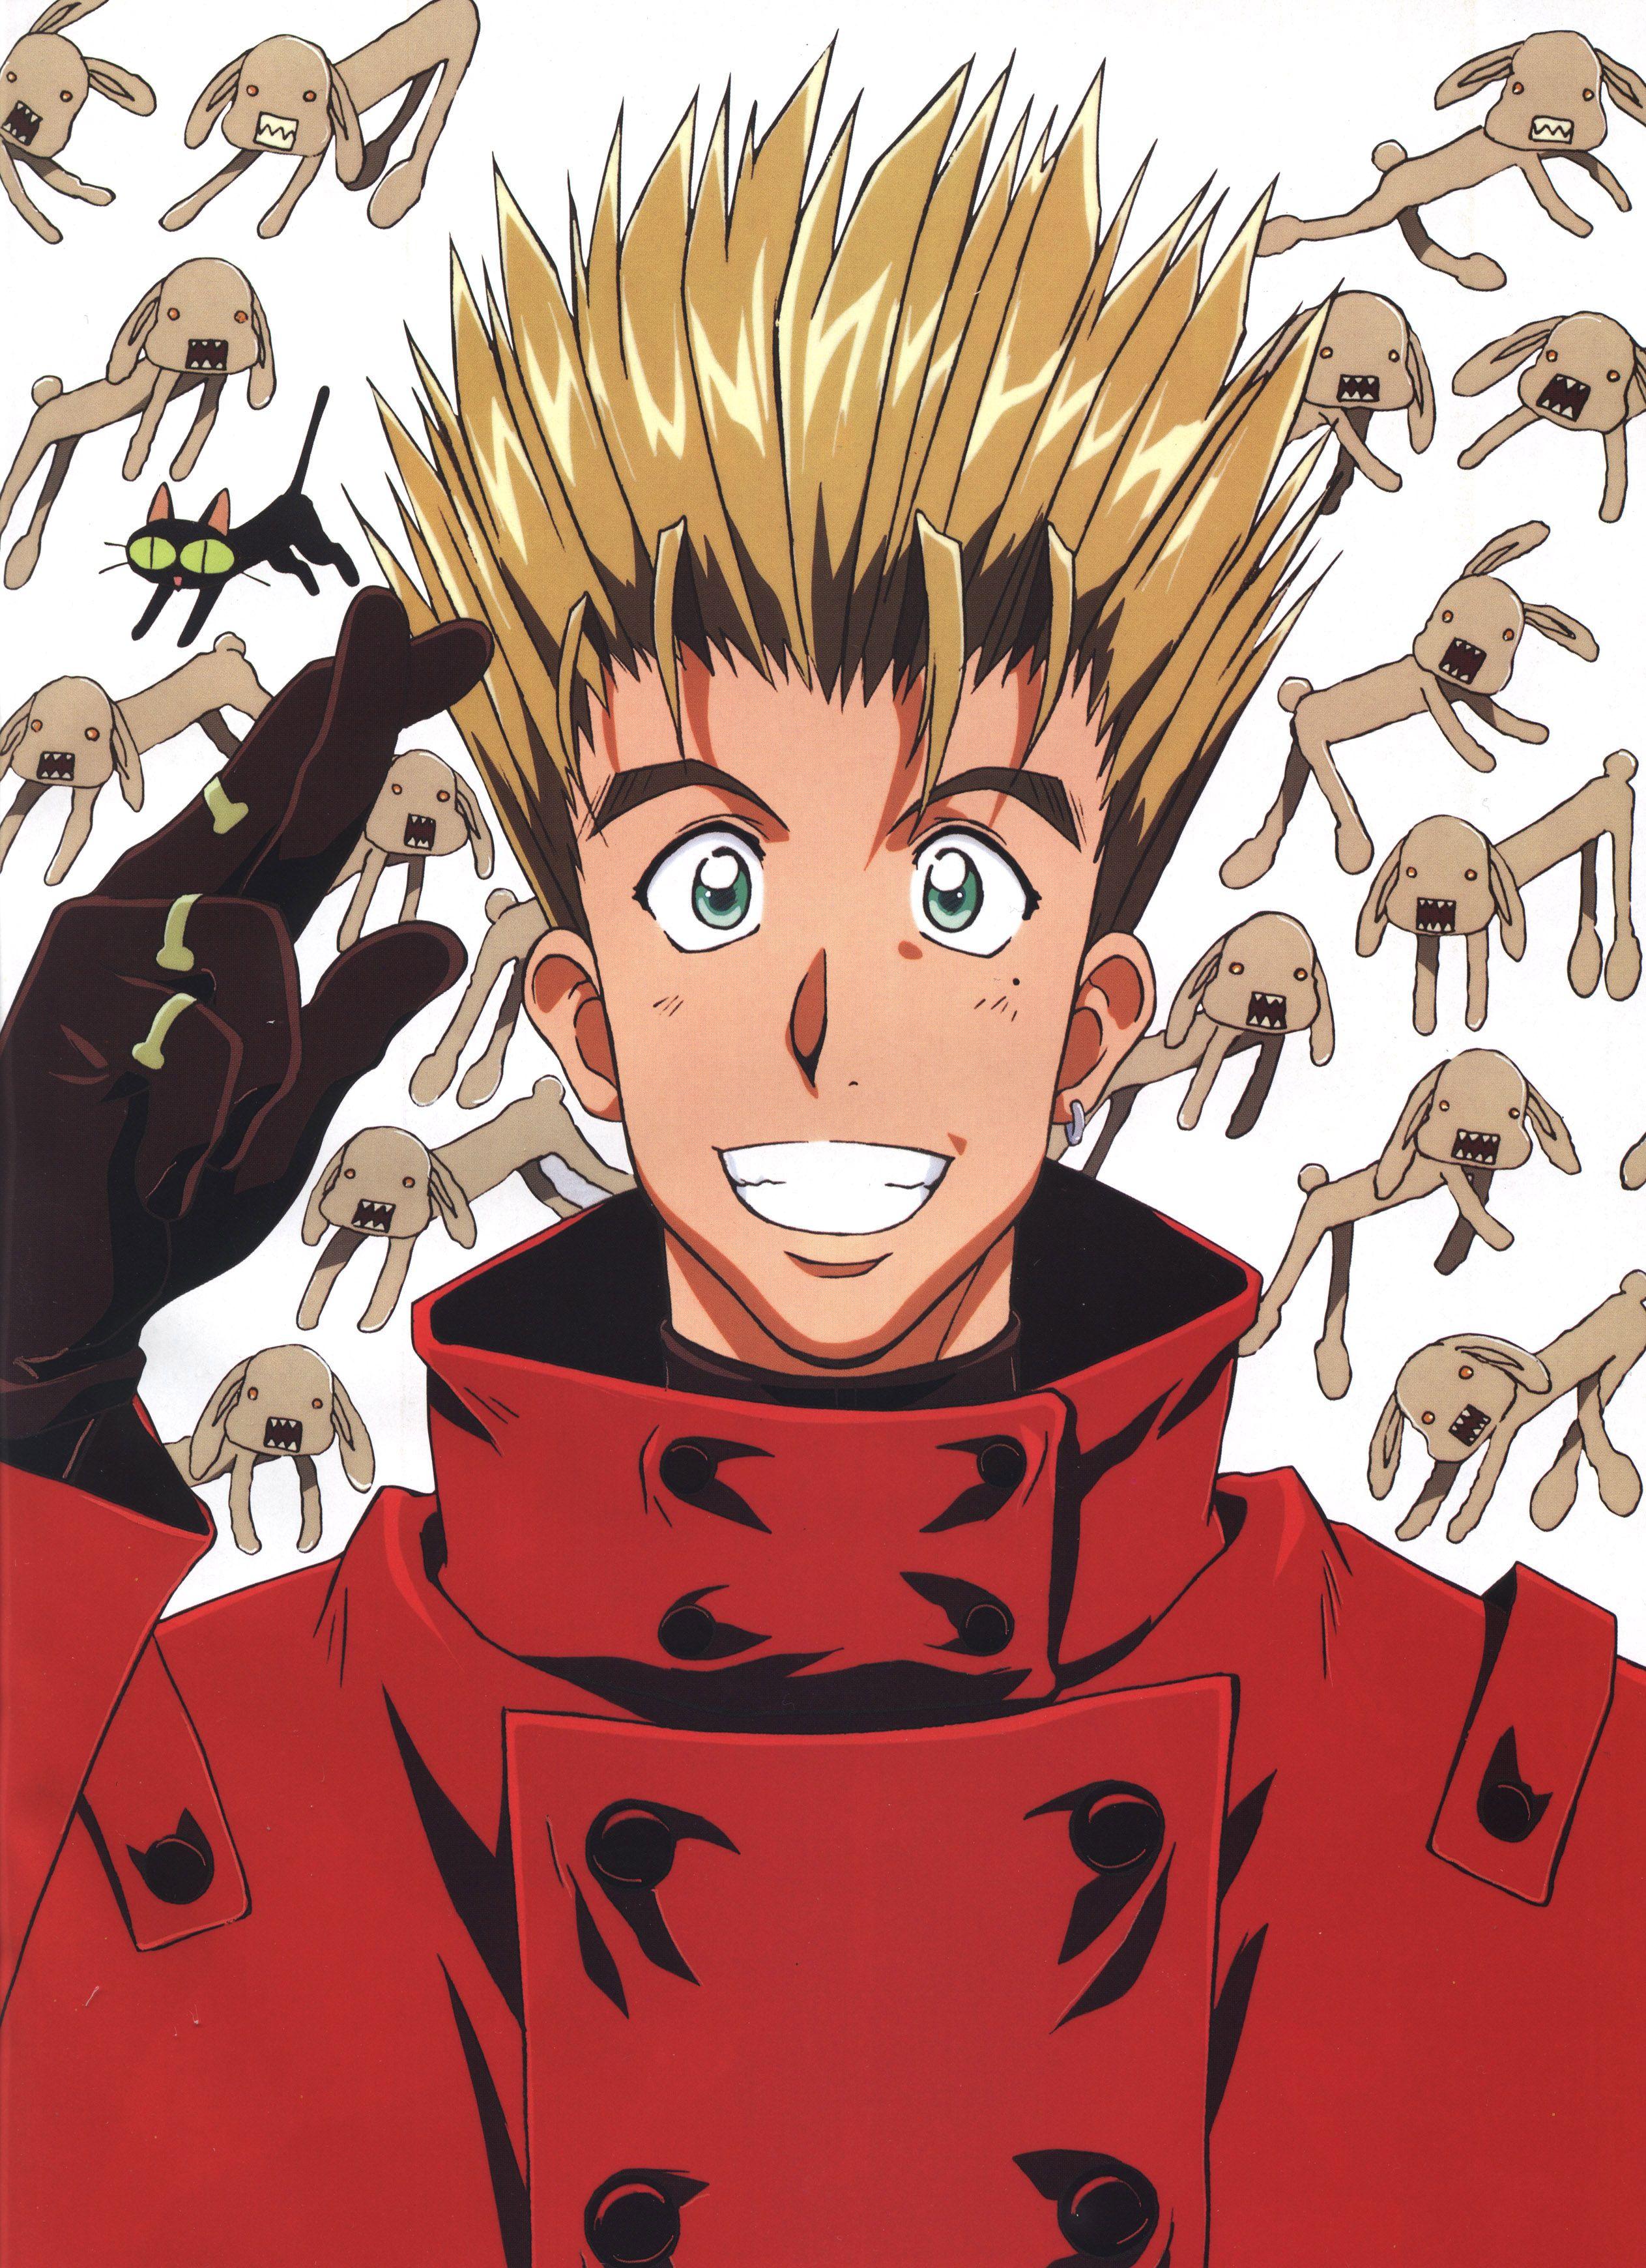 Trigun (With images) Trigun, Anime, Manga anime